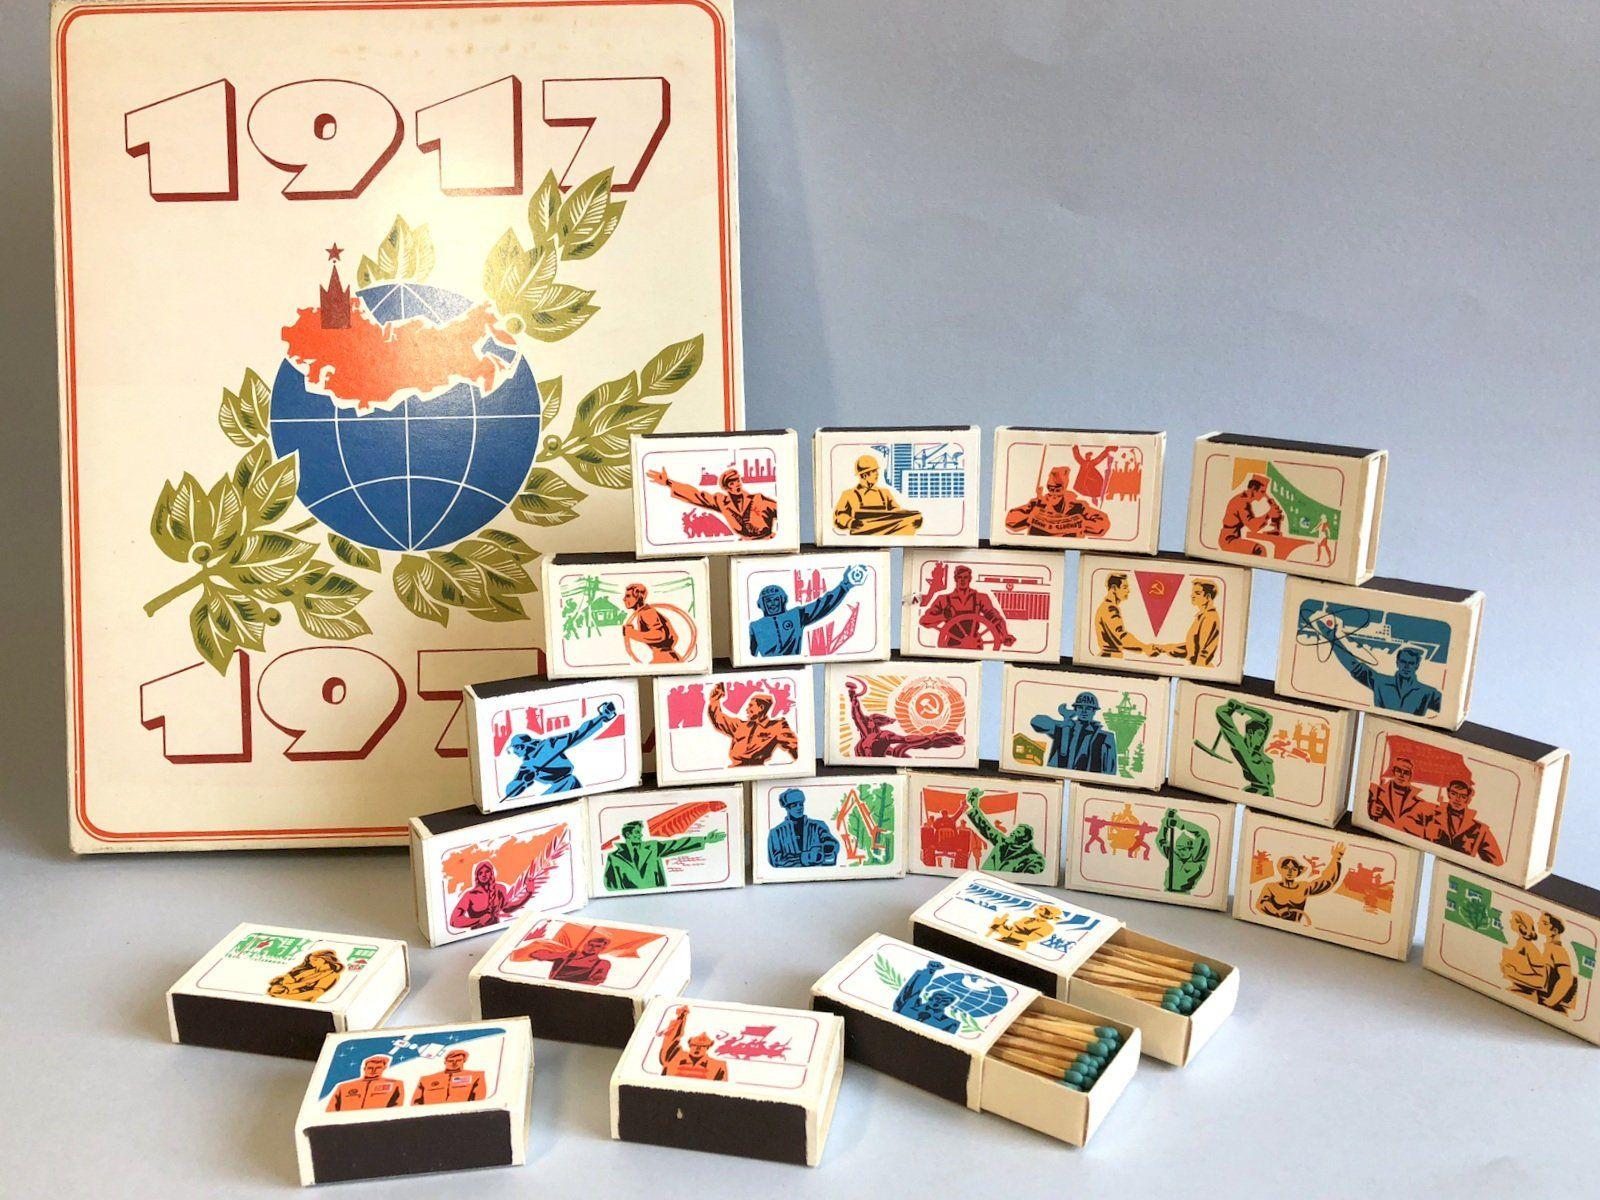 Vintage Soviet Rare Souvenir Box Matchbox Case for a Matchbox Moscow Kremlin Soviet Design Retro Home Decor Old Style Gift USSR